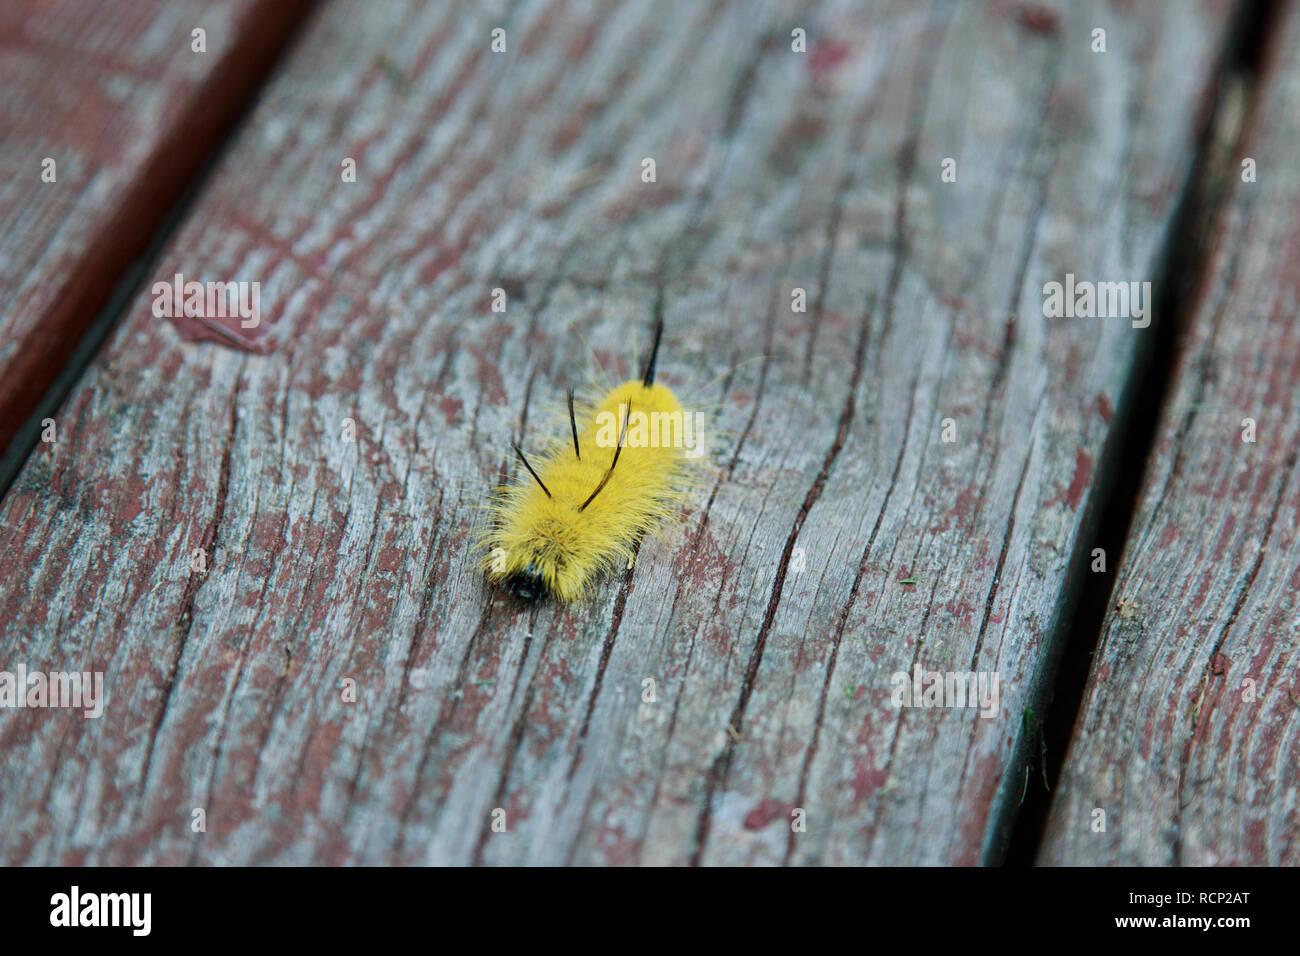 Yellow American Dagger Moth caterpillar crawling on the wood. - Stock Image